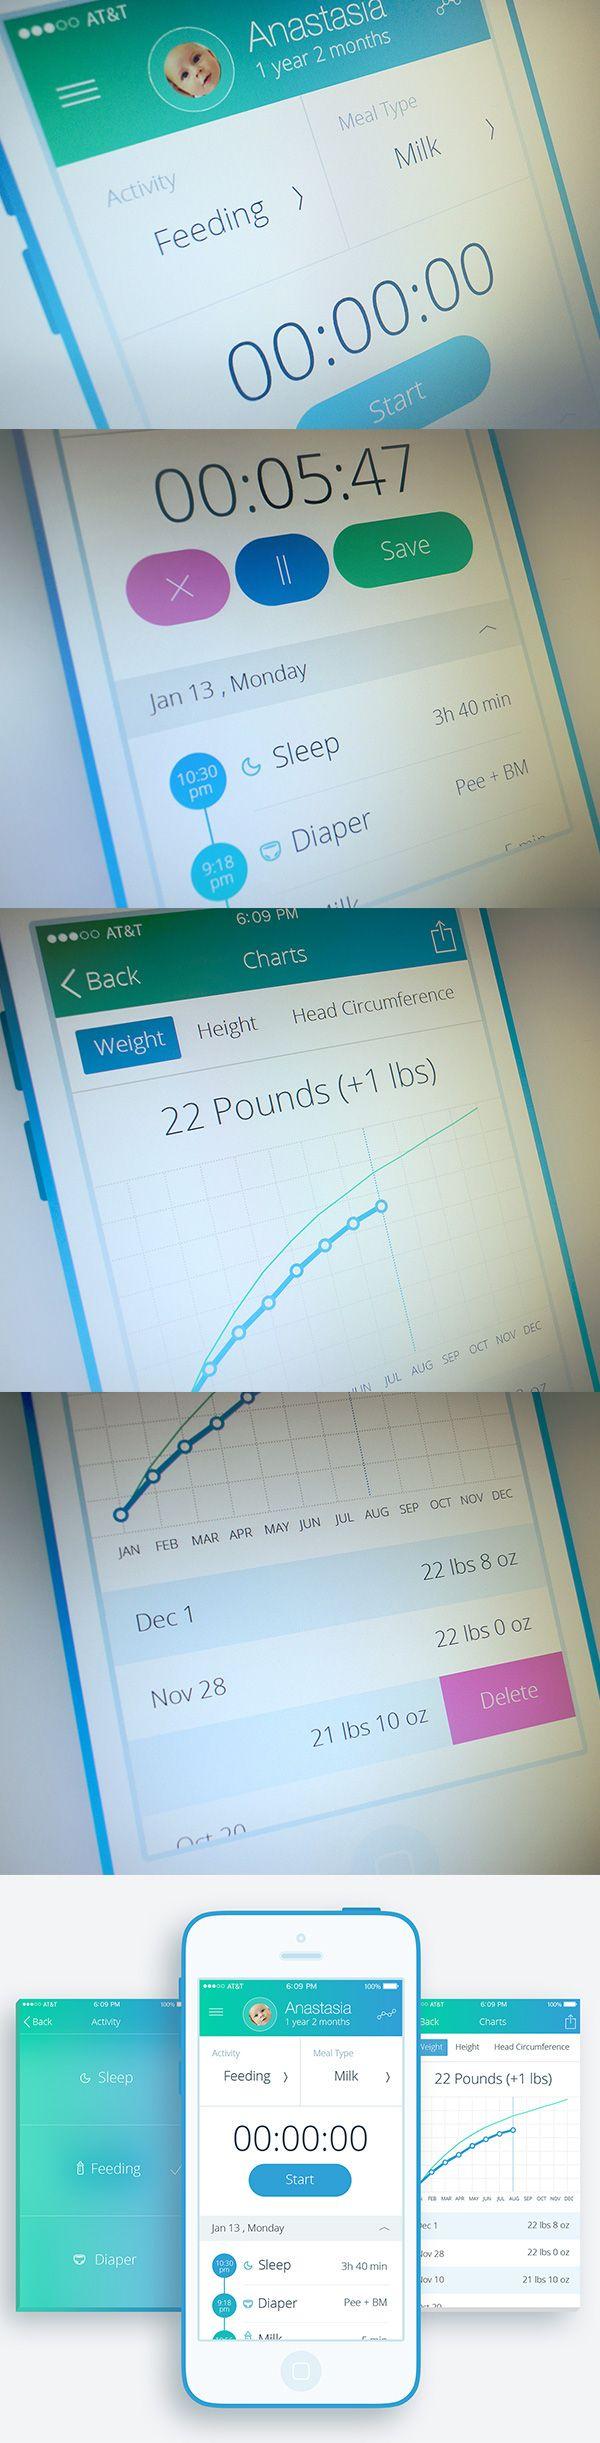 Baby Health Monitoring App on Behance------------------------------------------------------------------------ gui캡스톤 과제에 도움될 자료. 기능면 참고